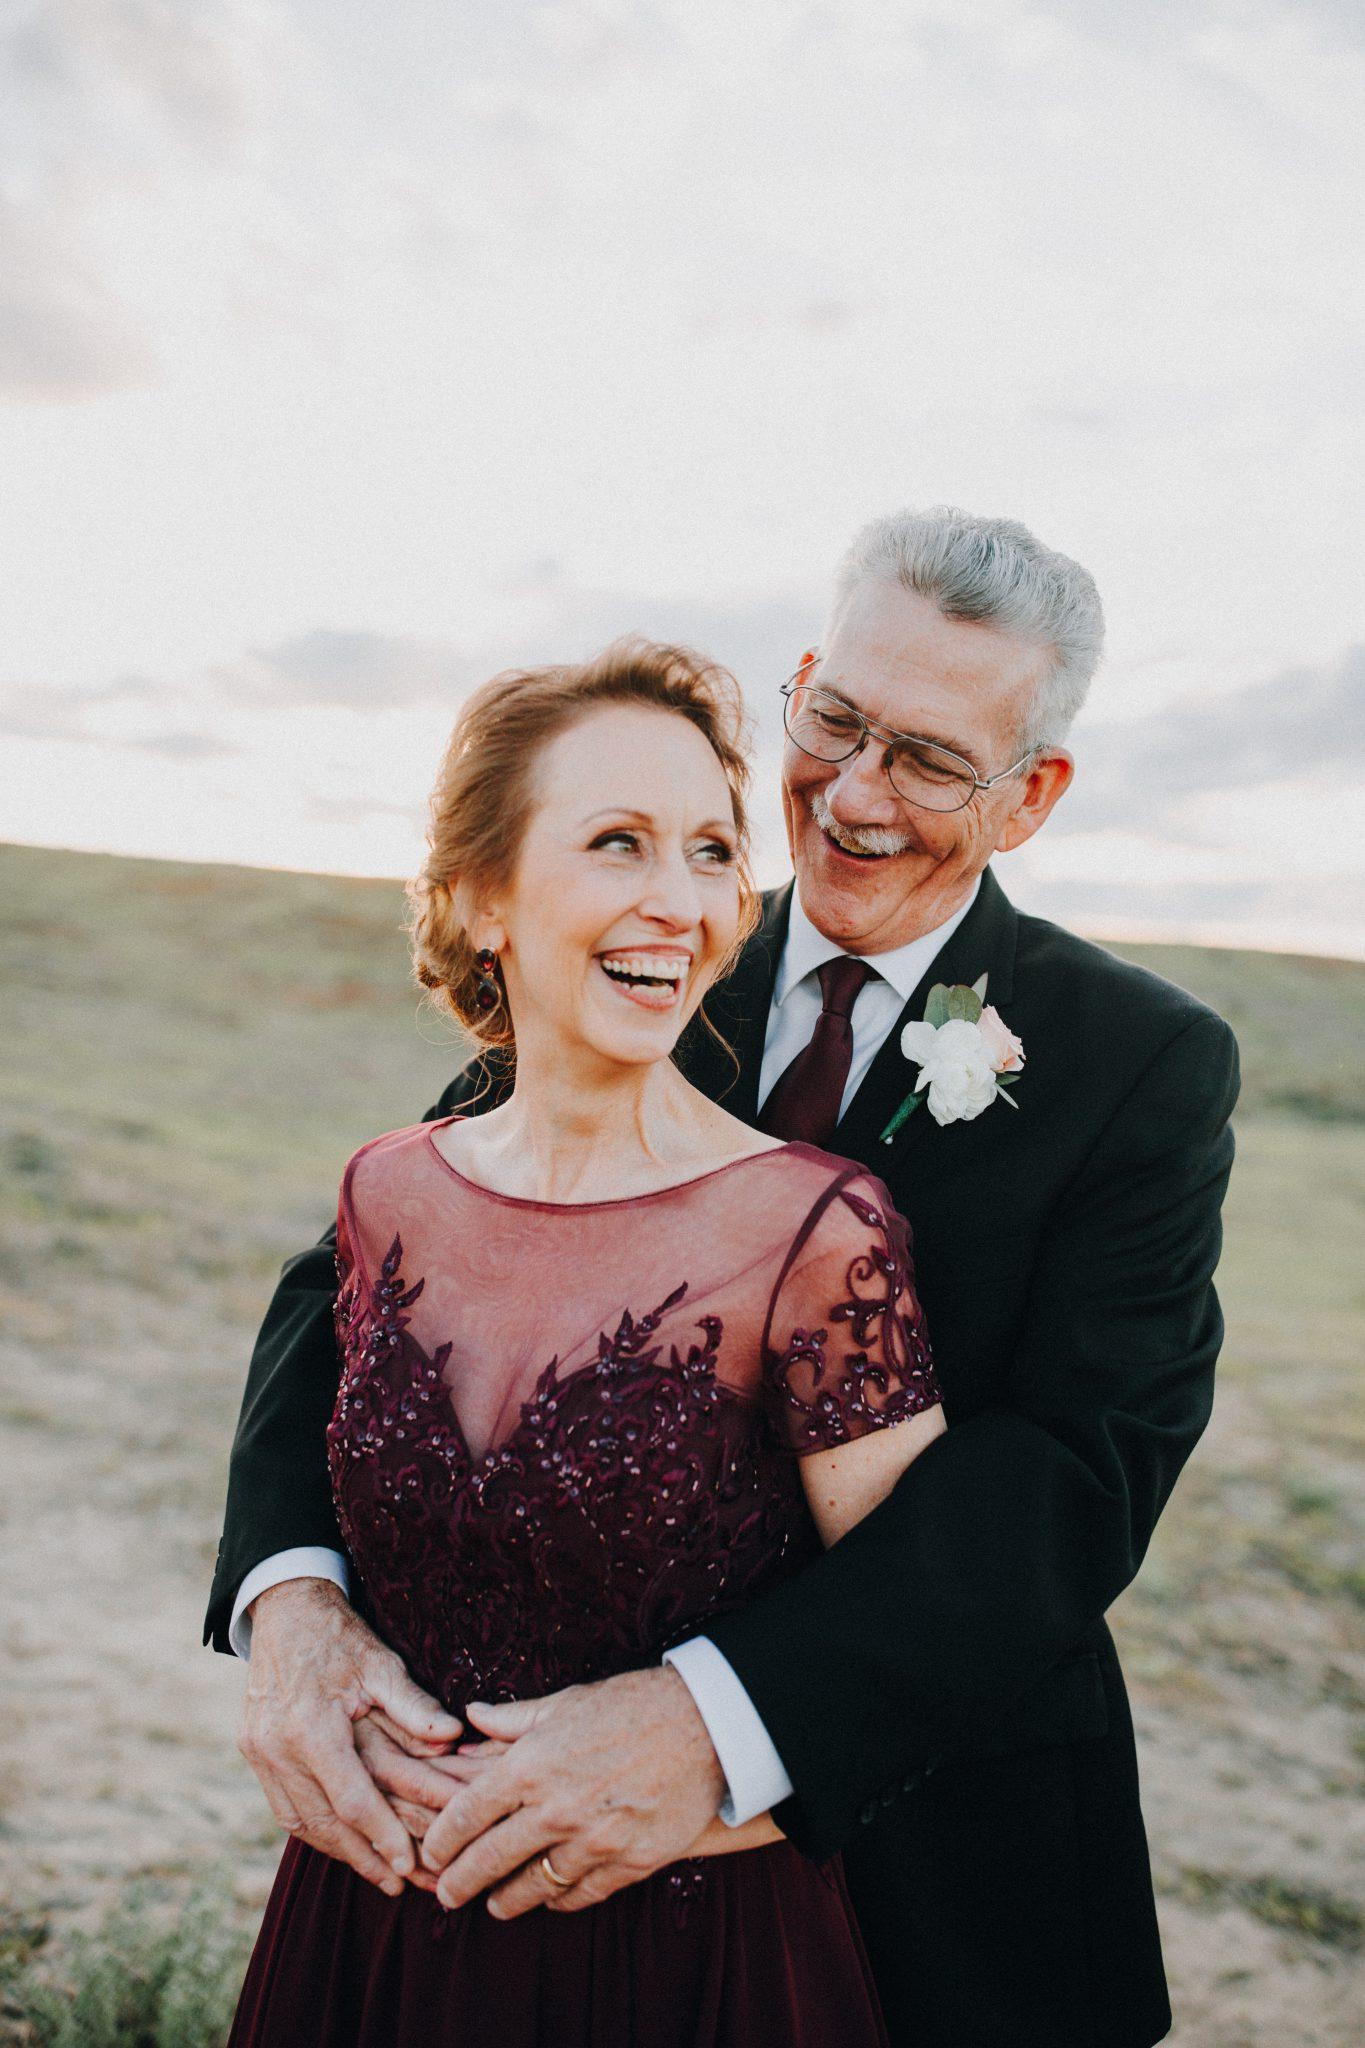 wedding couple, mature bride, wedding photographer